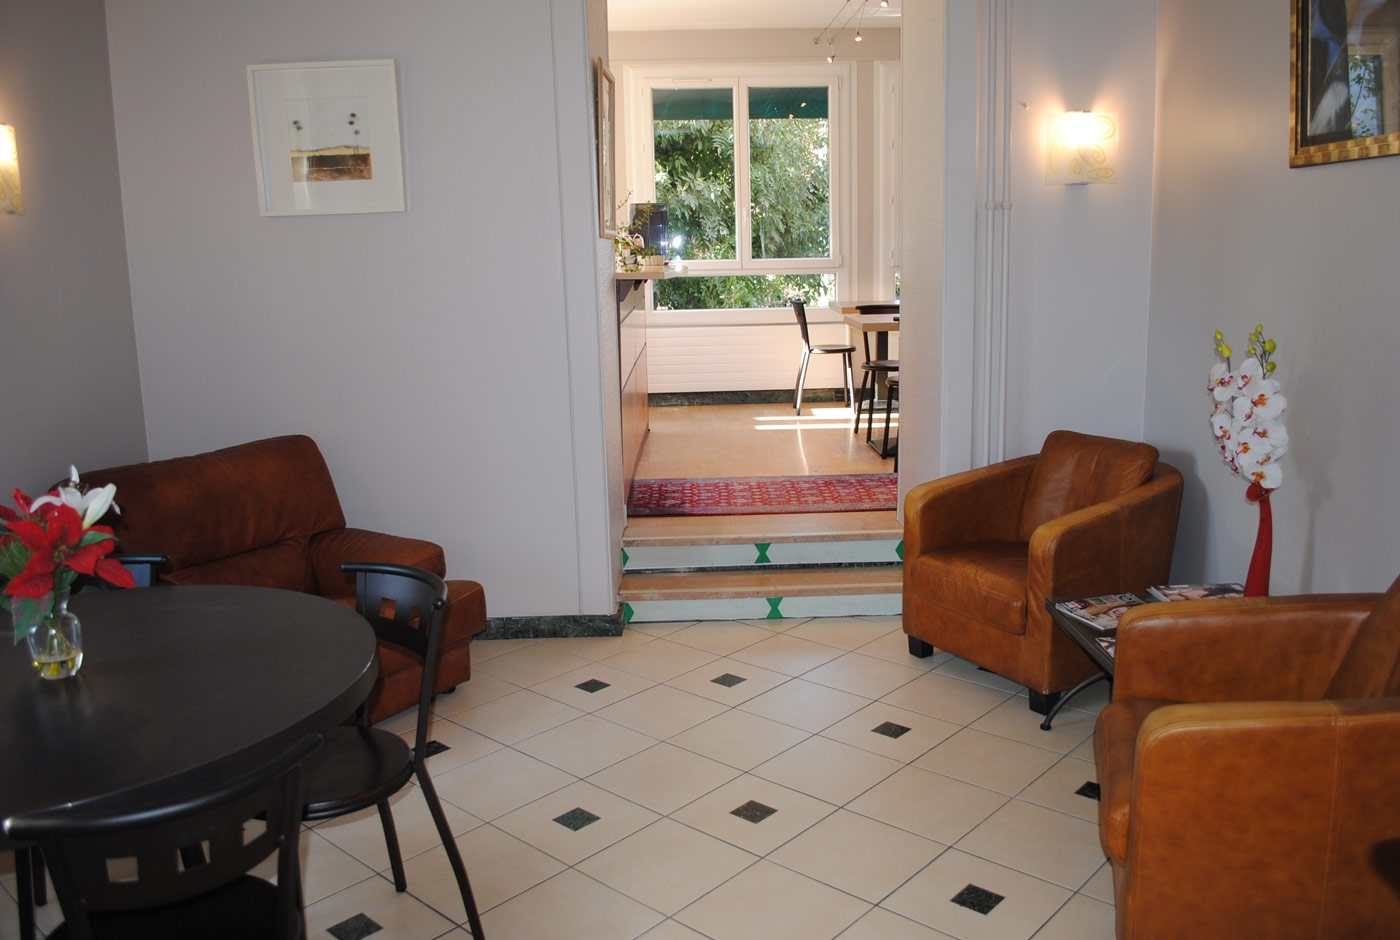 hotel-lacassagne-home-slide07